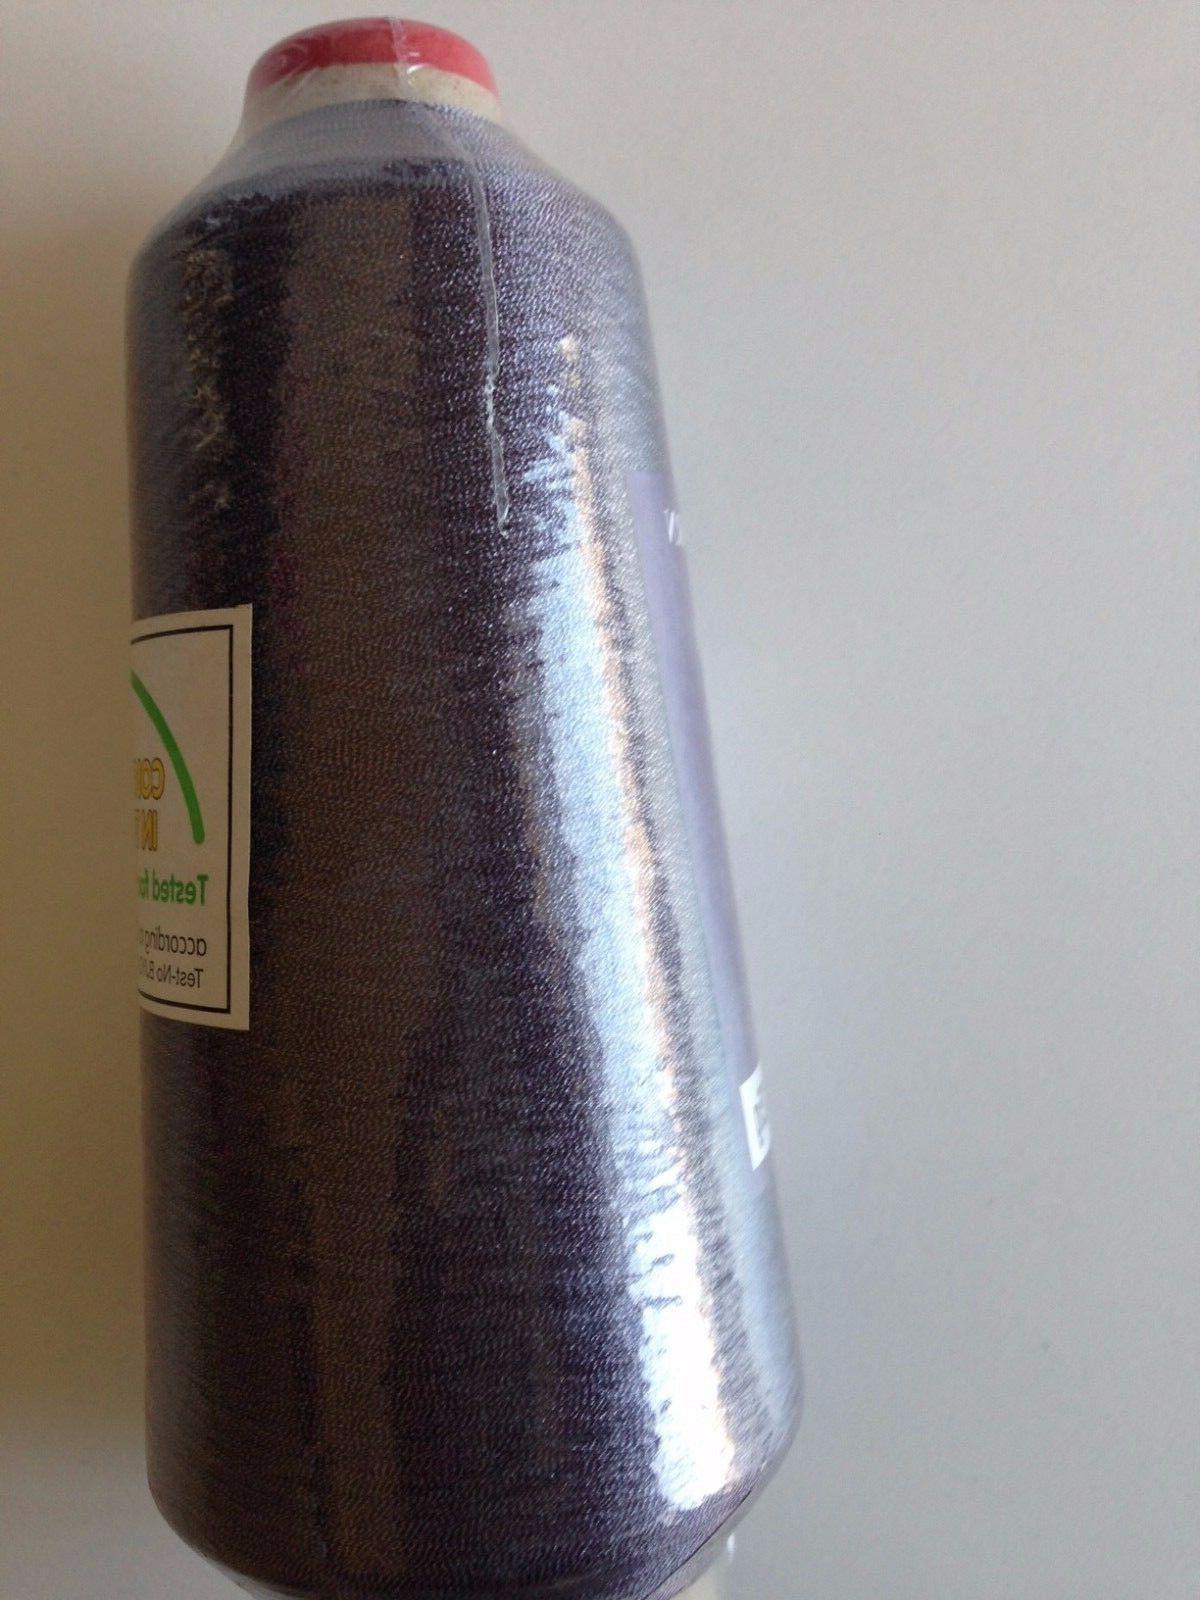 Metallic Embroidery Machine Spool 40 5500 Y